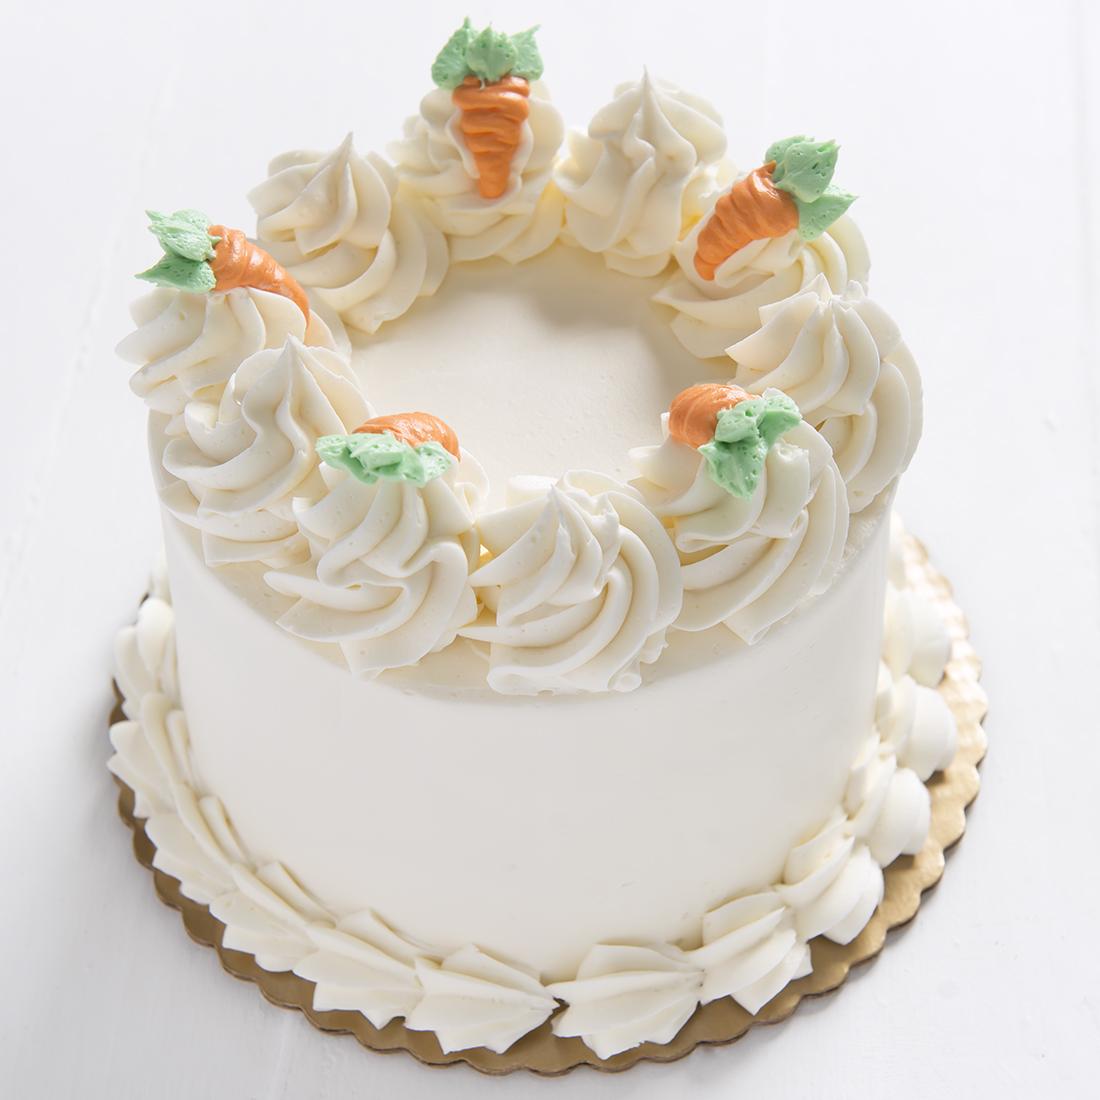 Carrot Cake - Carrot cake made with shredded carrots, coconut, pineapple, raisins & cinnamon, cream cheese filling, vanilla buttercream frosting6